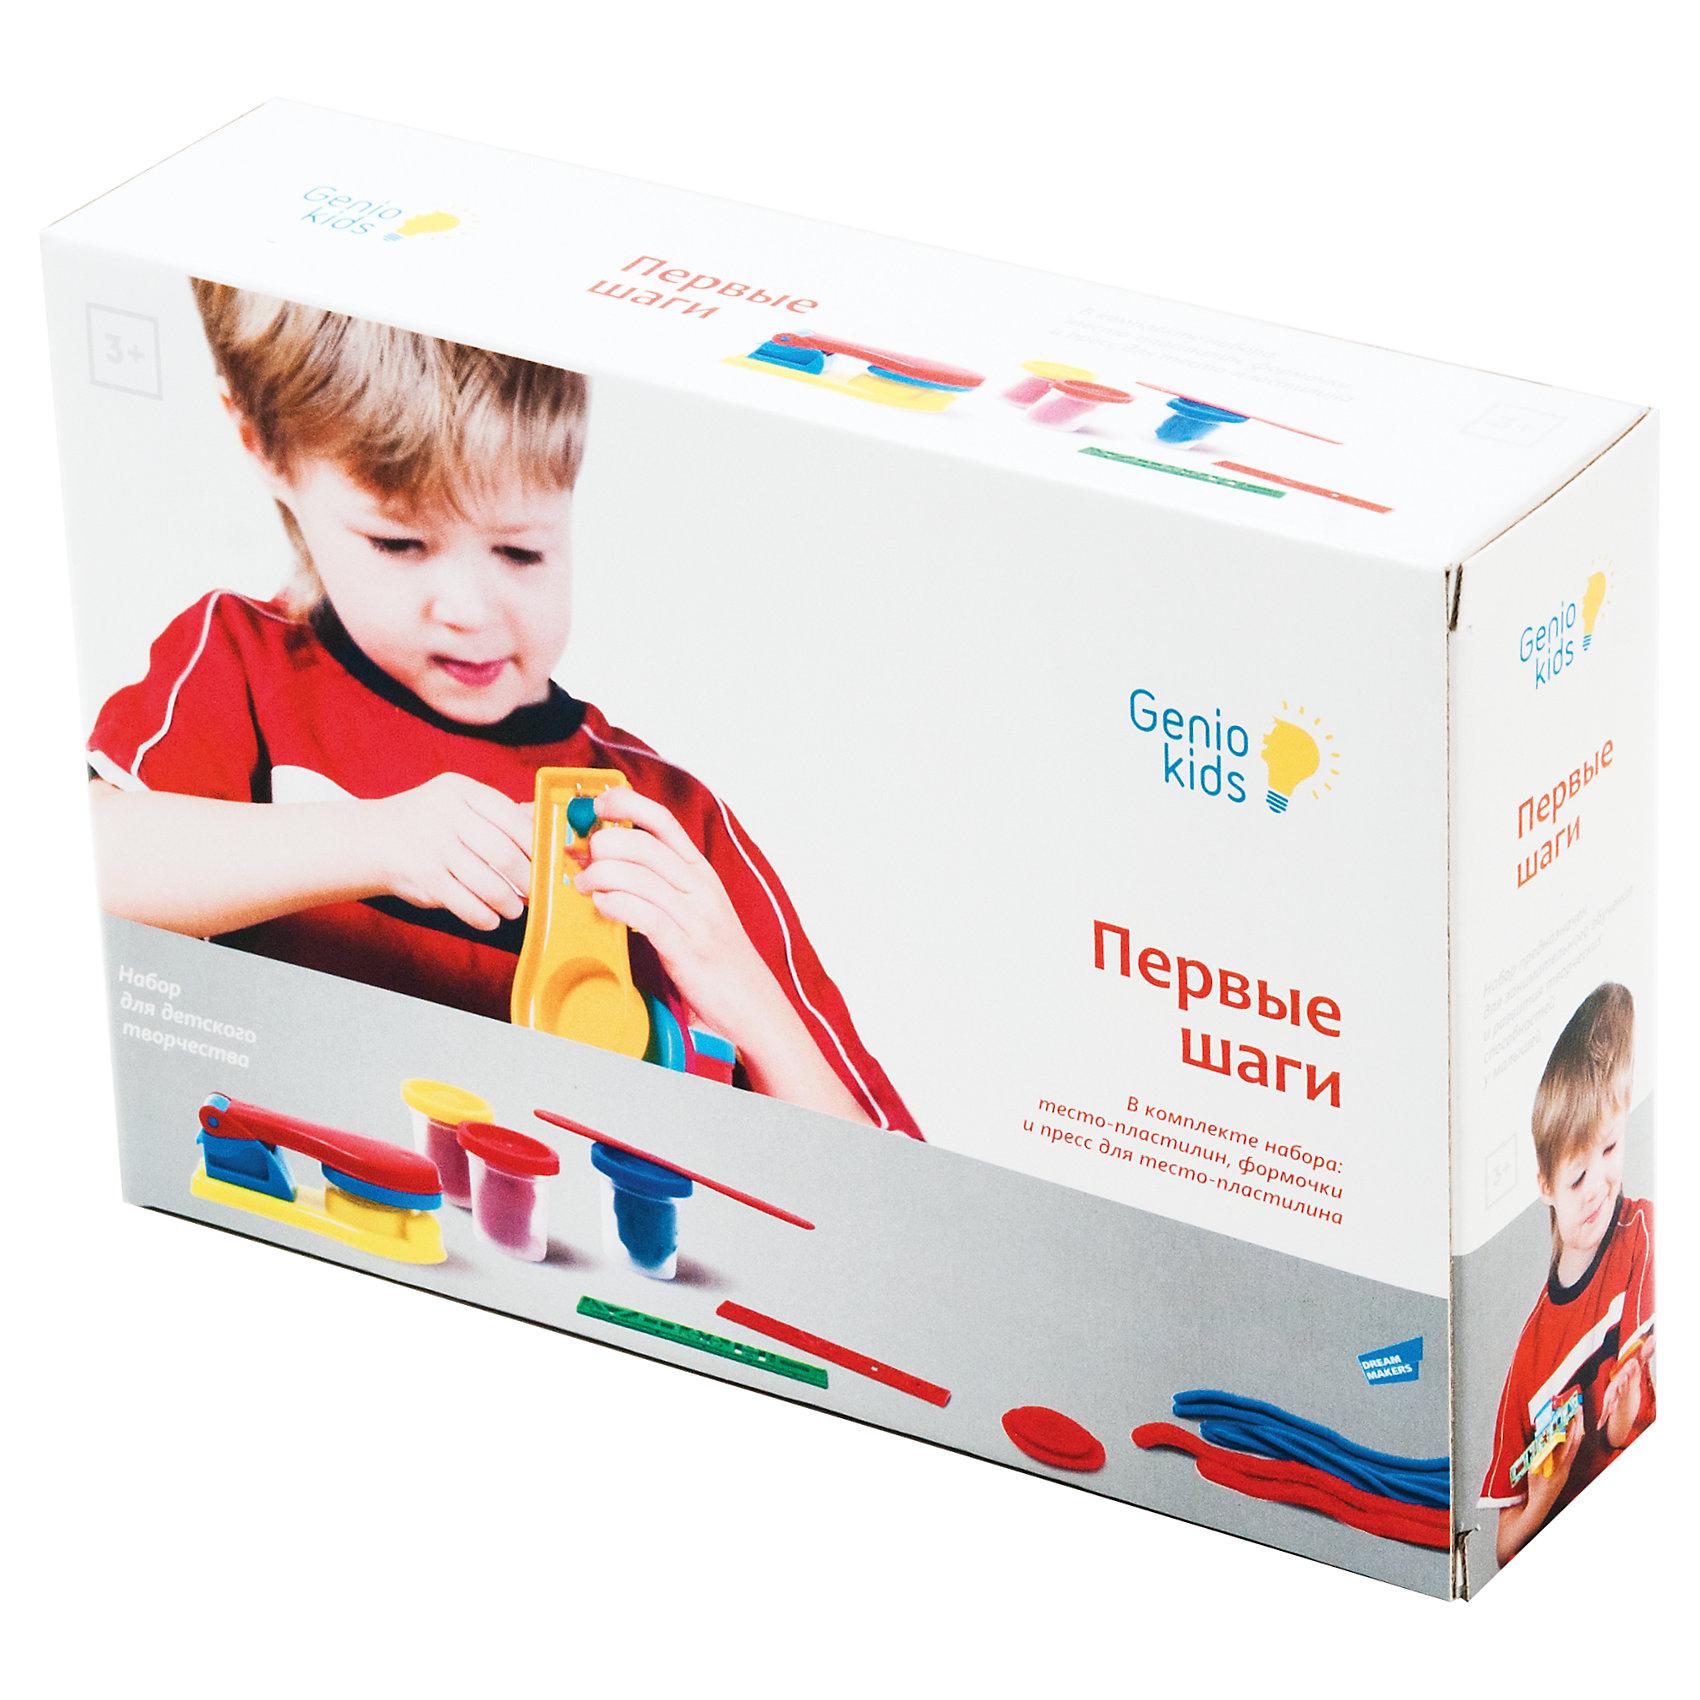 "Genio Kids Набор для детской лепки Первые шаги genio kids набор для детского творчества ""шкатулка"""